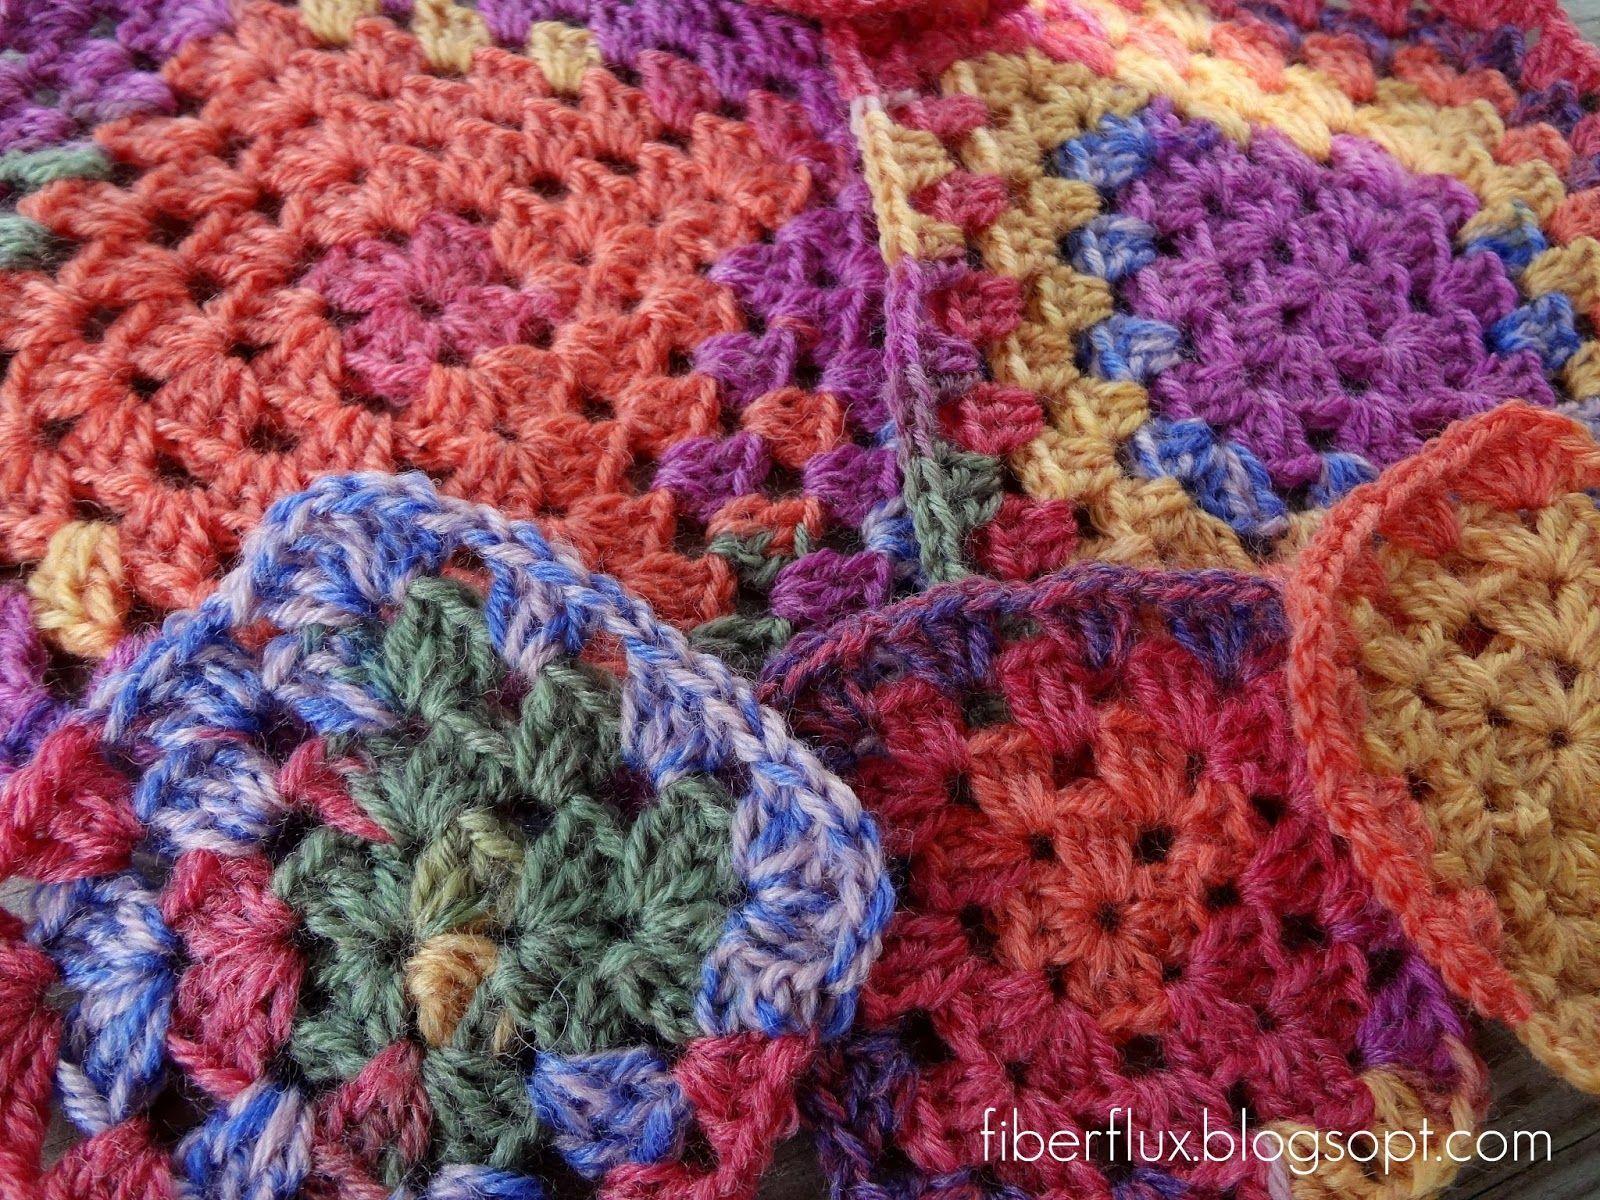 variegated yarn granny square blanket - Google Search | Crochet ...